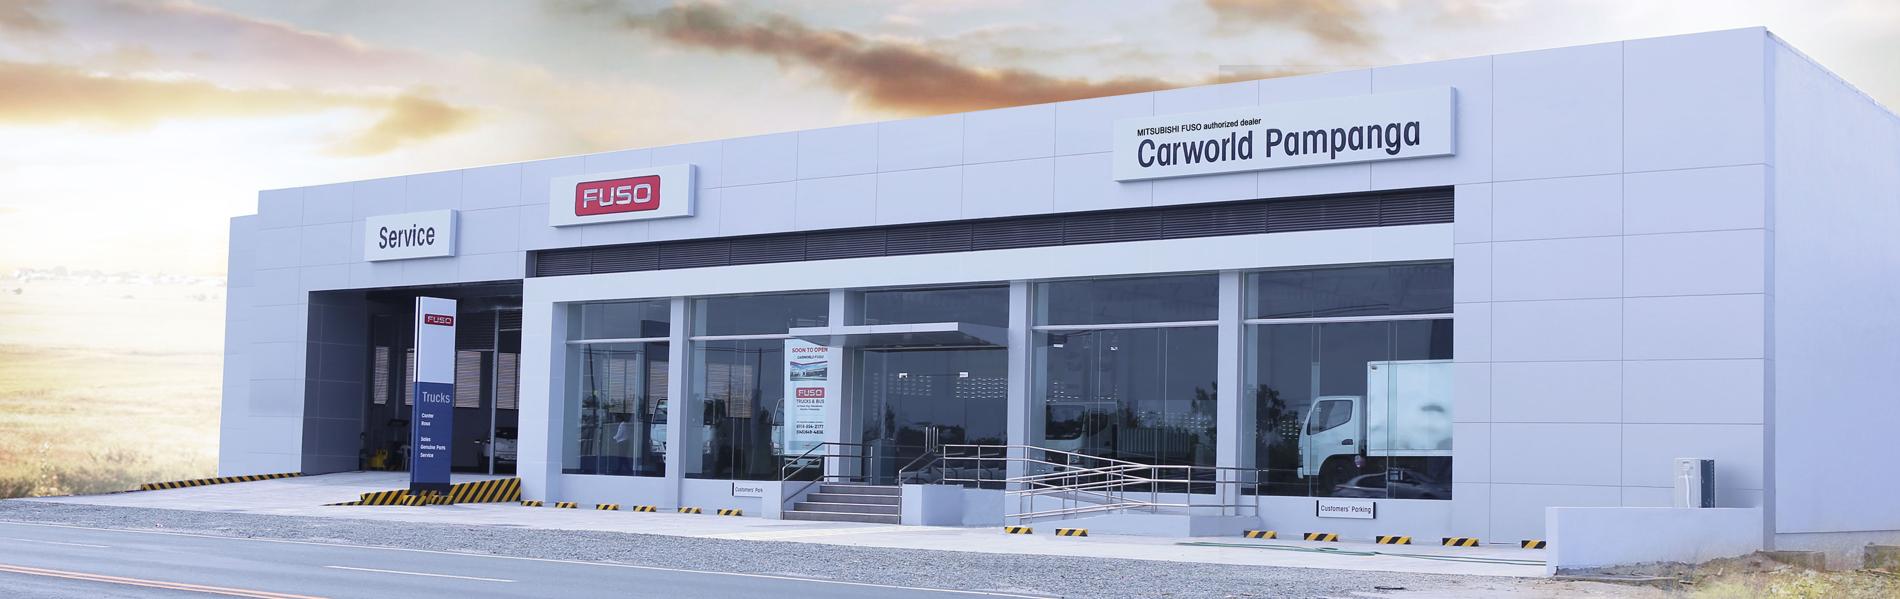 FUSO Carworld Pampanga- Mitsubishi Car Dealer